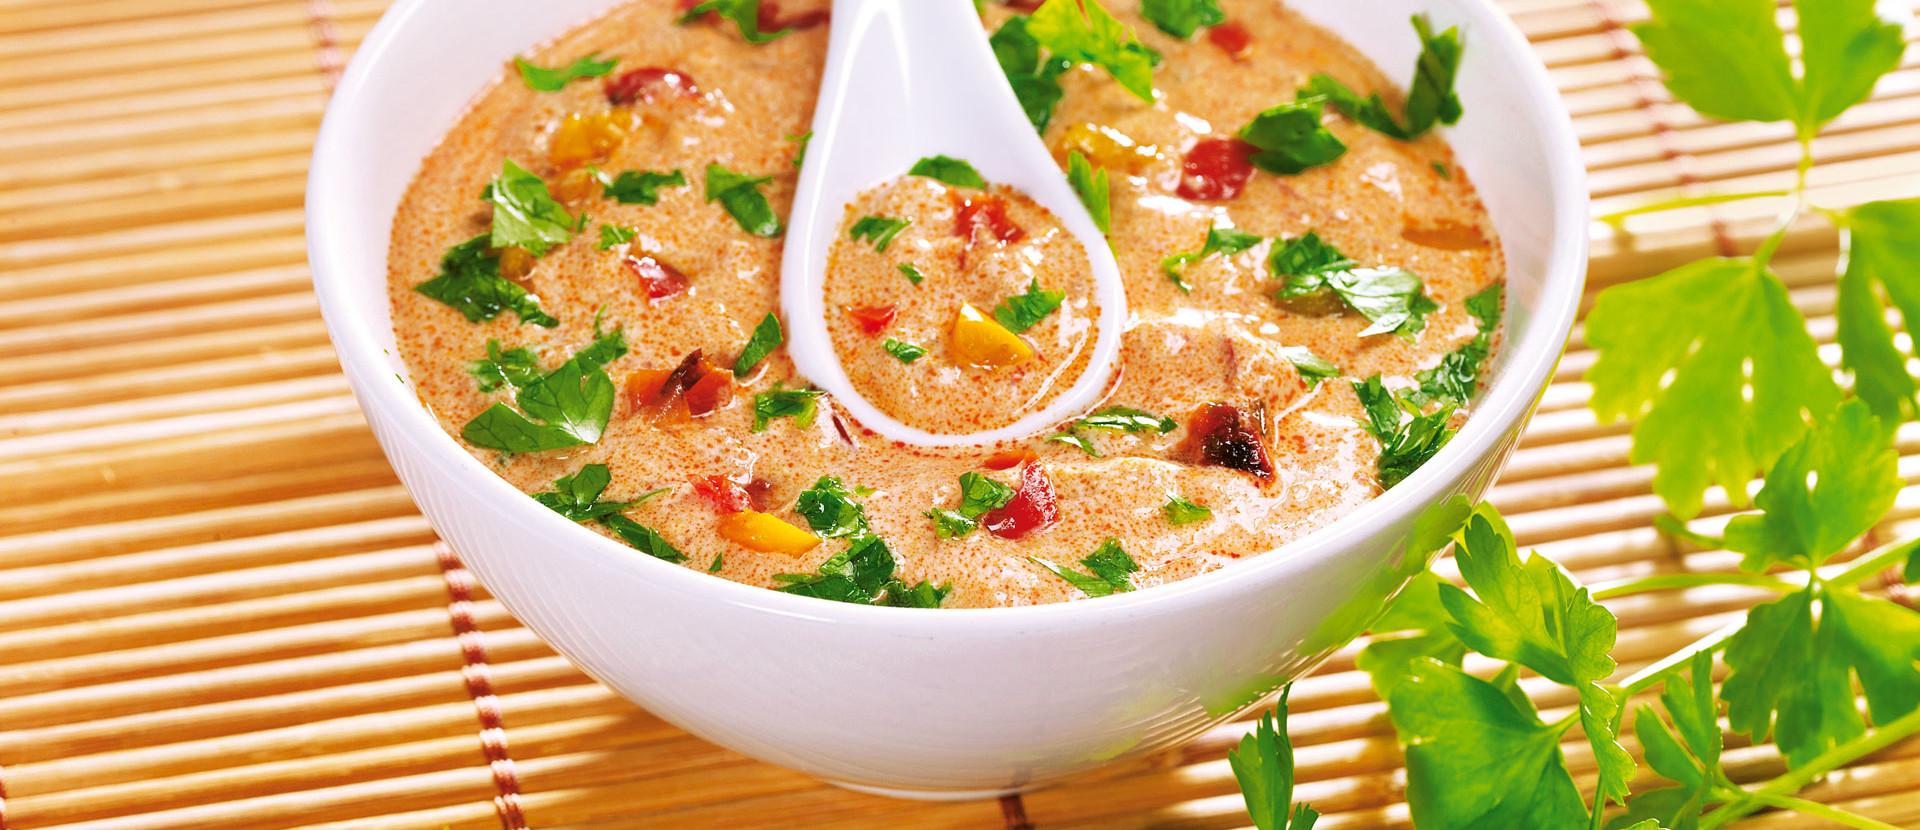 Orientalische Joghurt Paprika Sauce